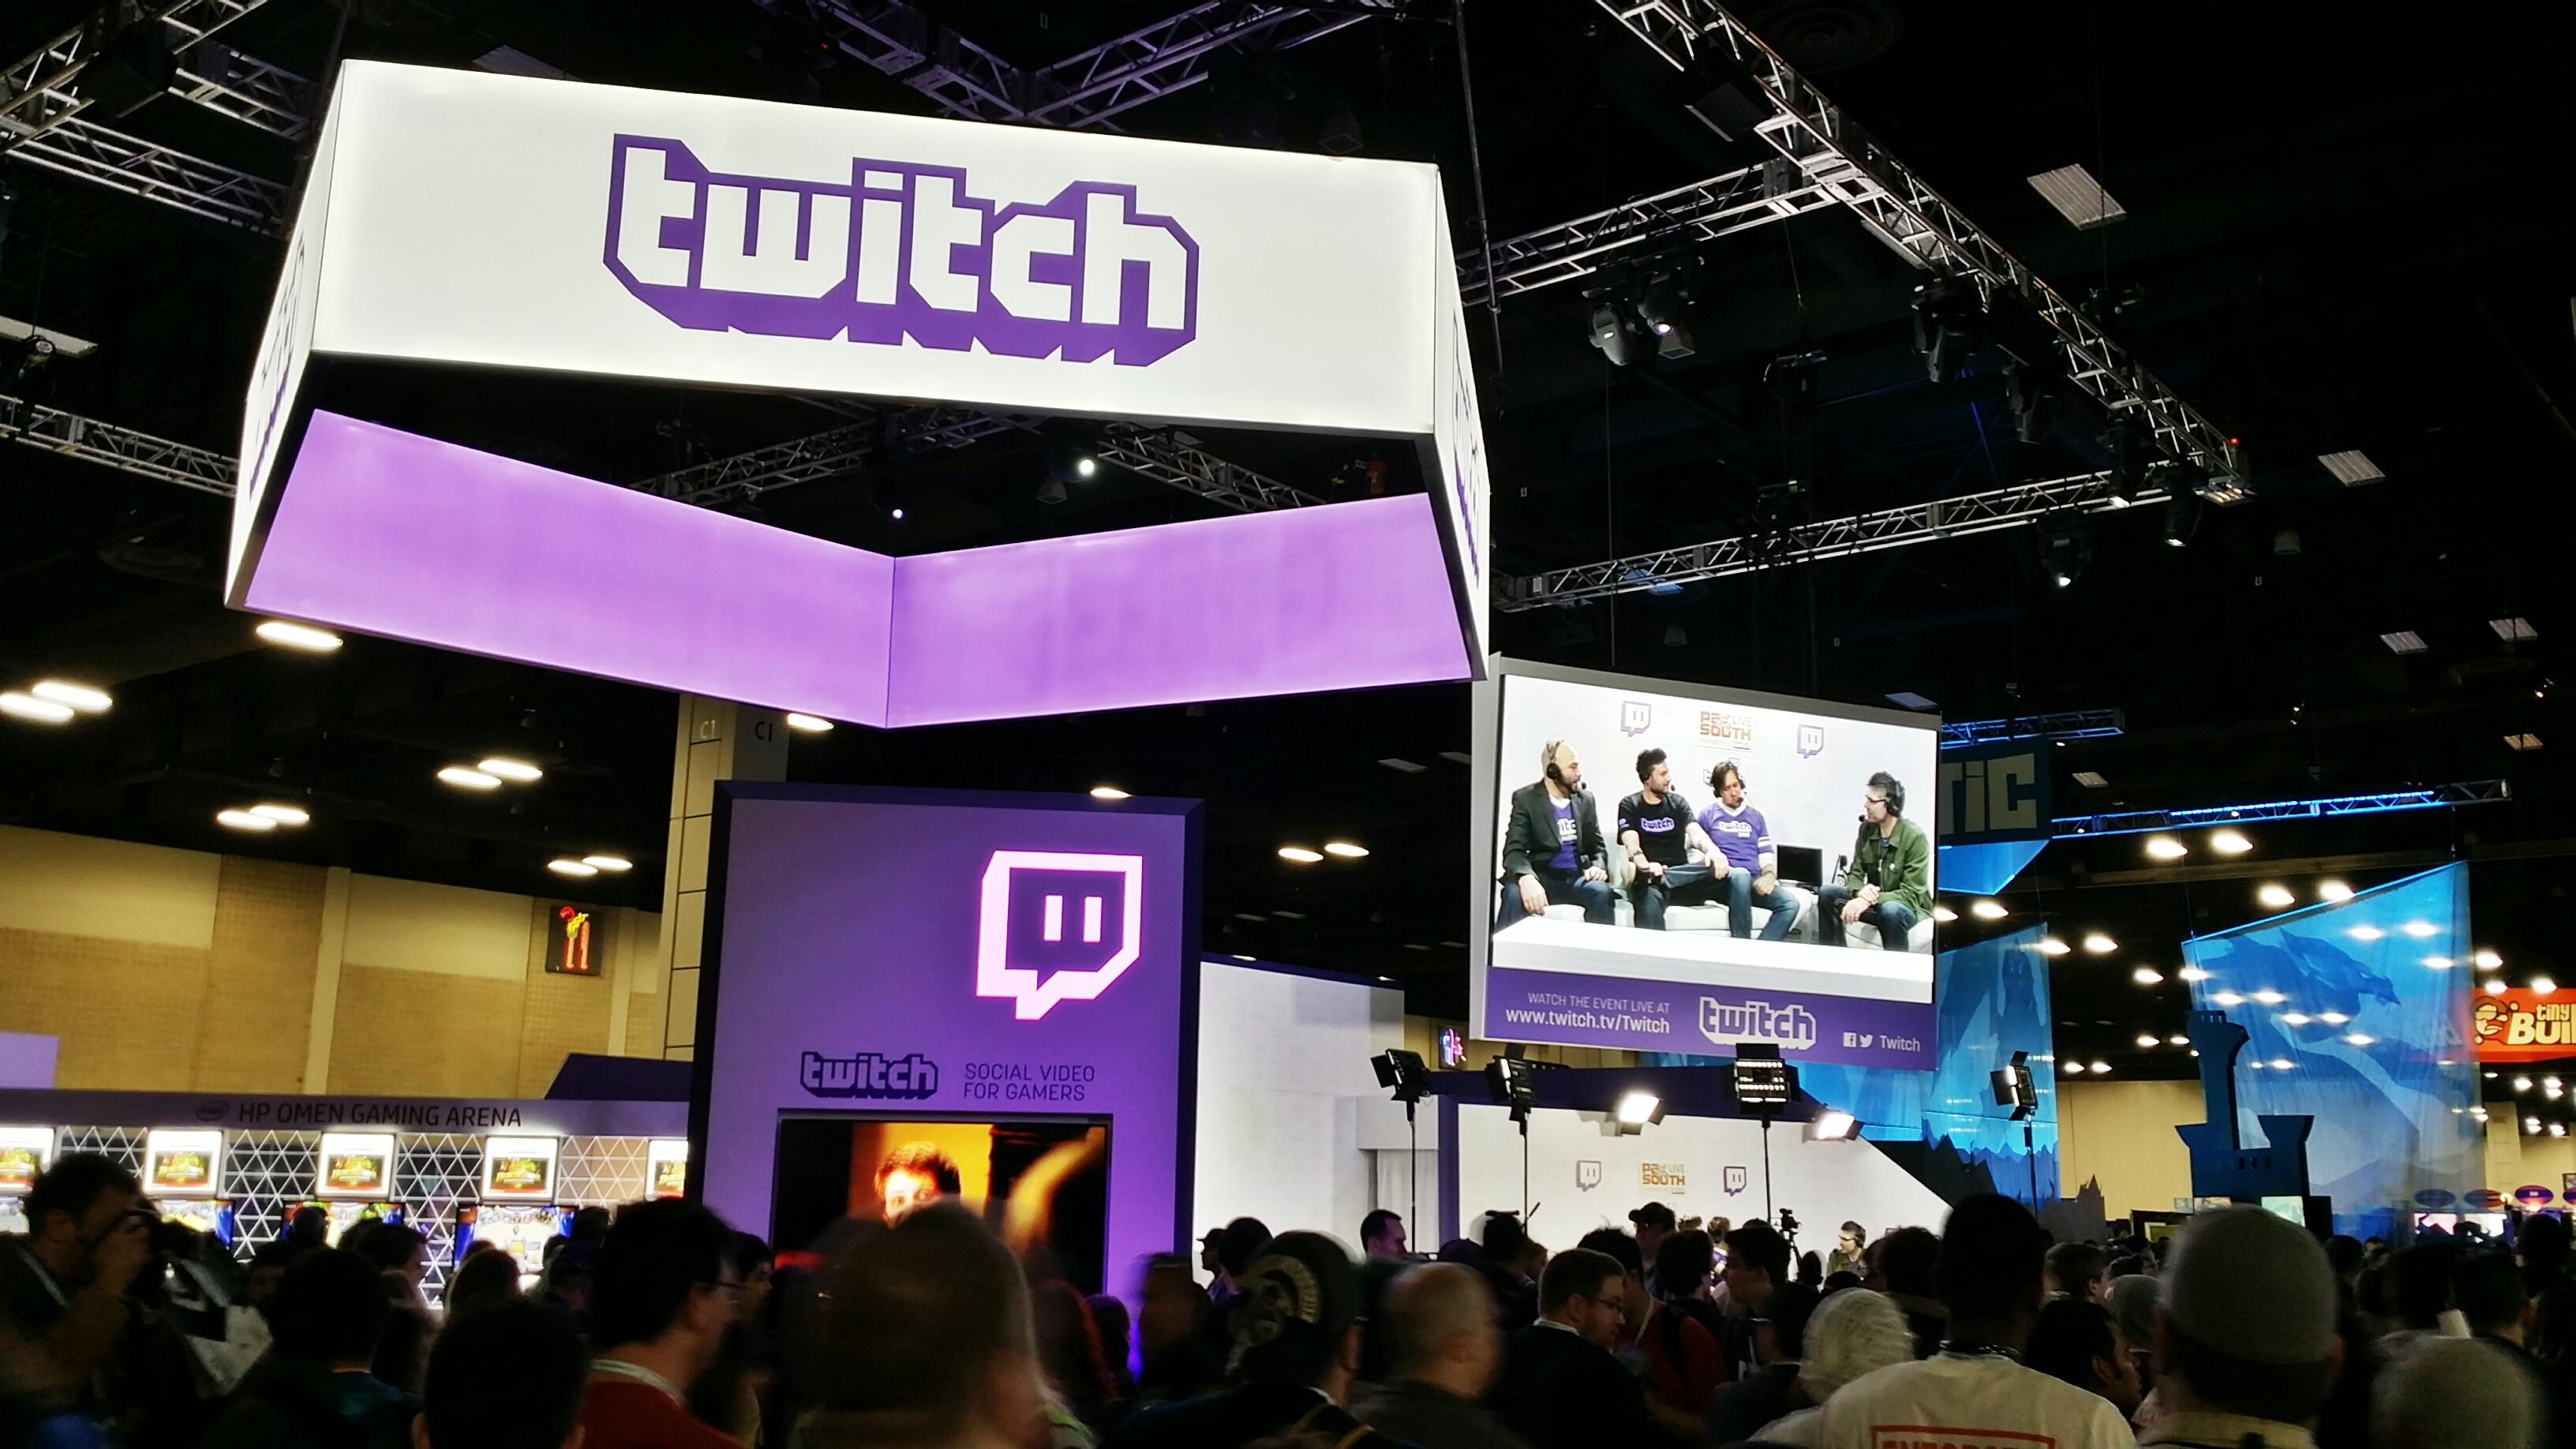 twitch-twitchcon-pax-east-live-stream-overwatch